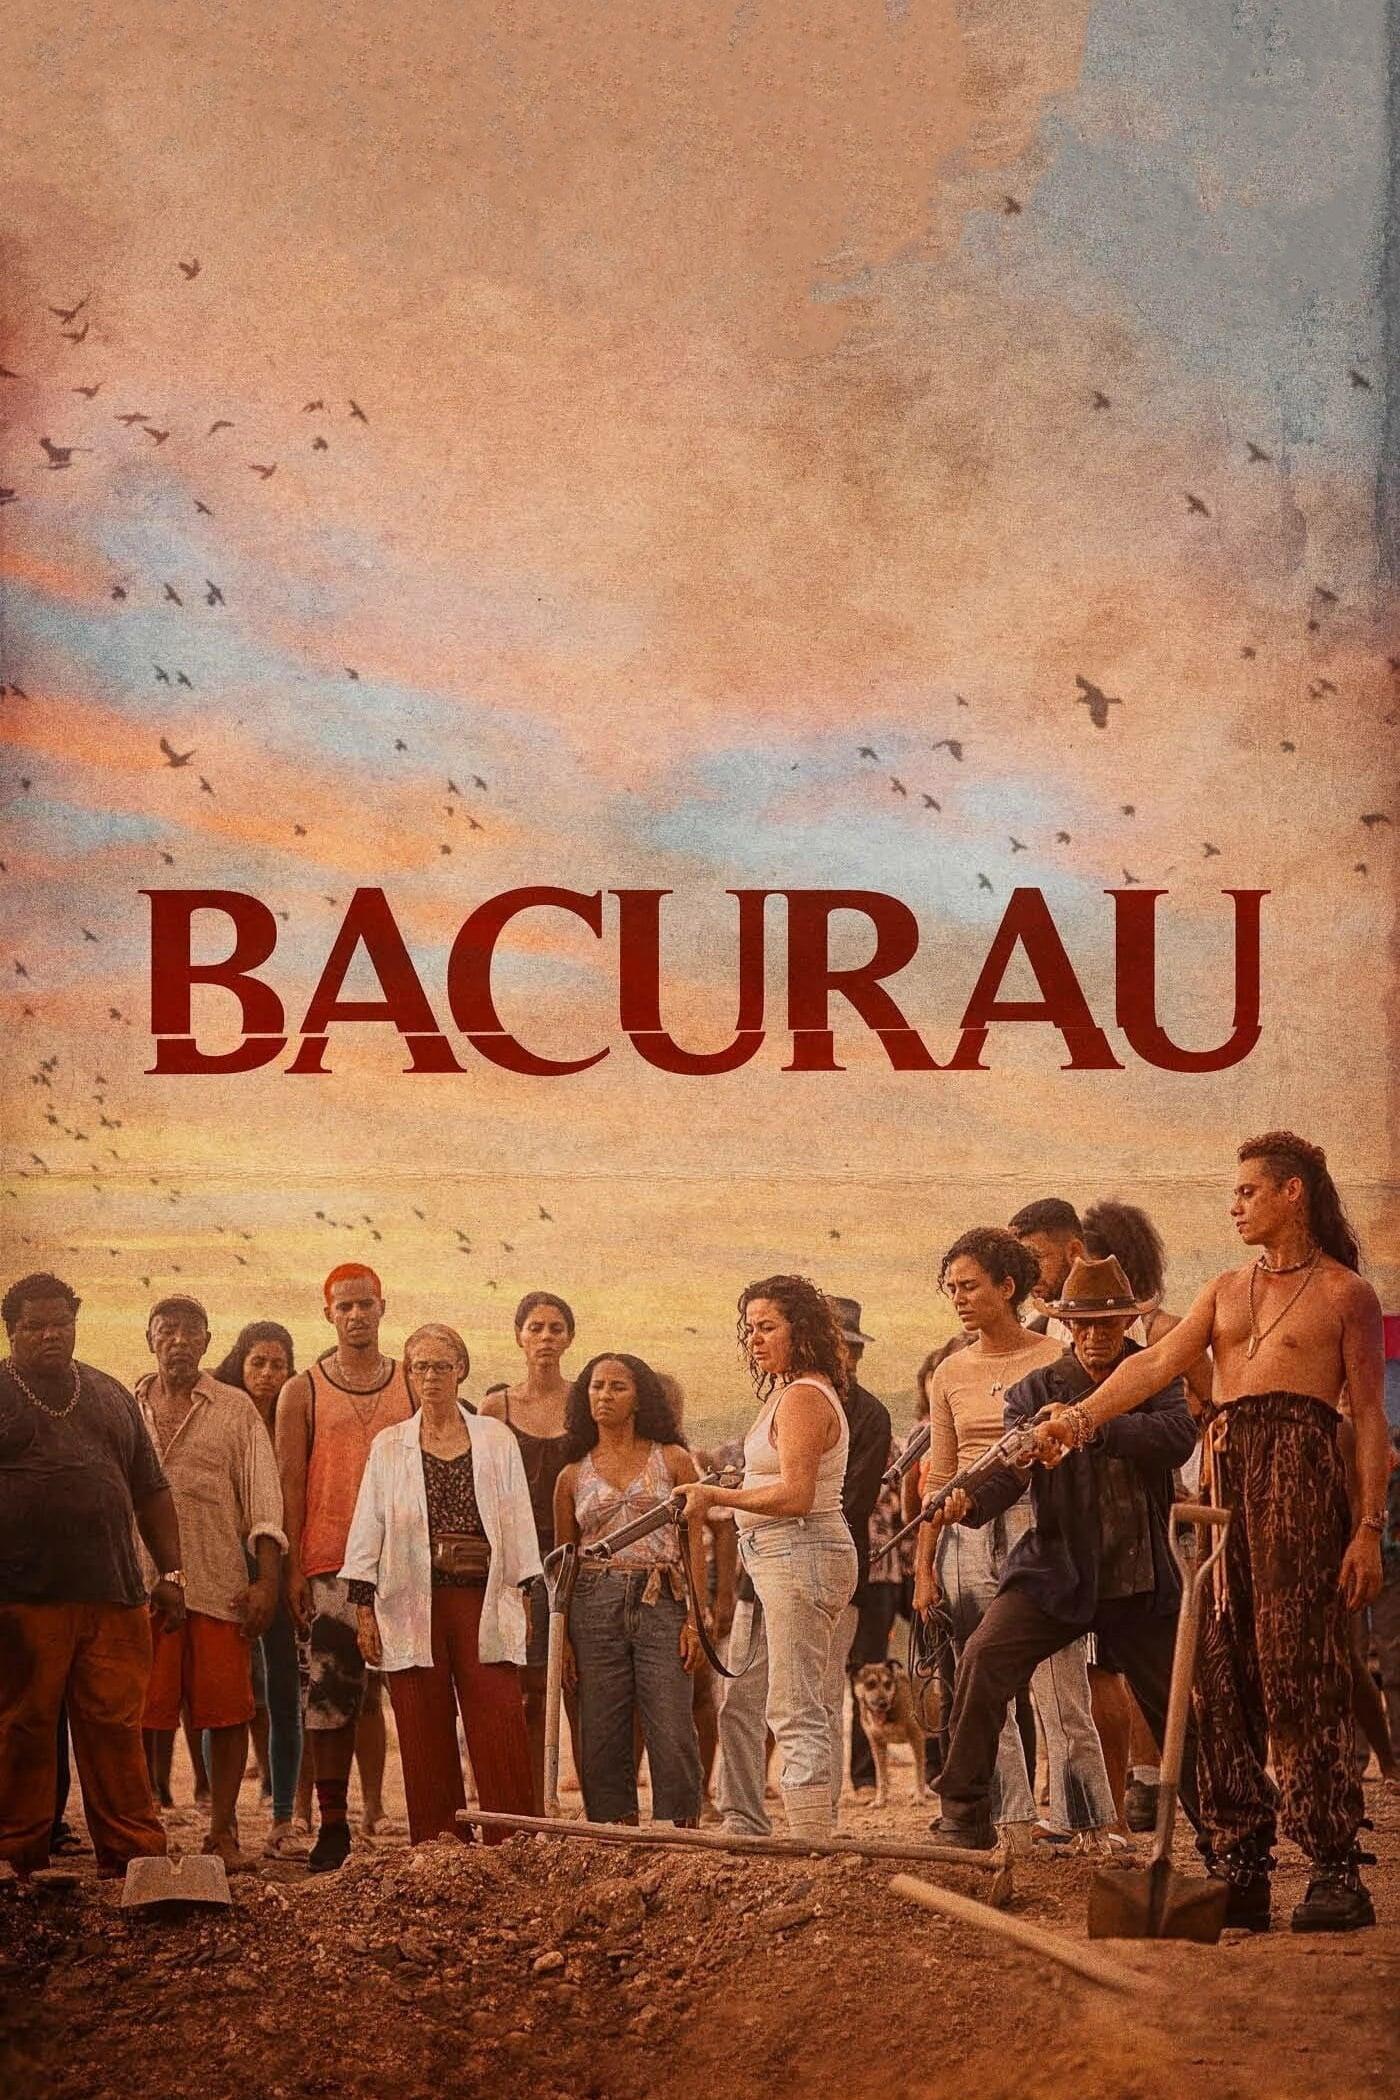 Poster for Bacurau